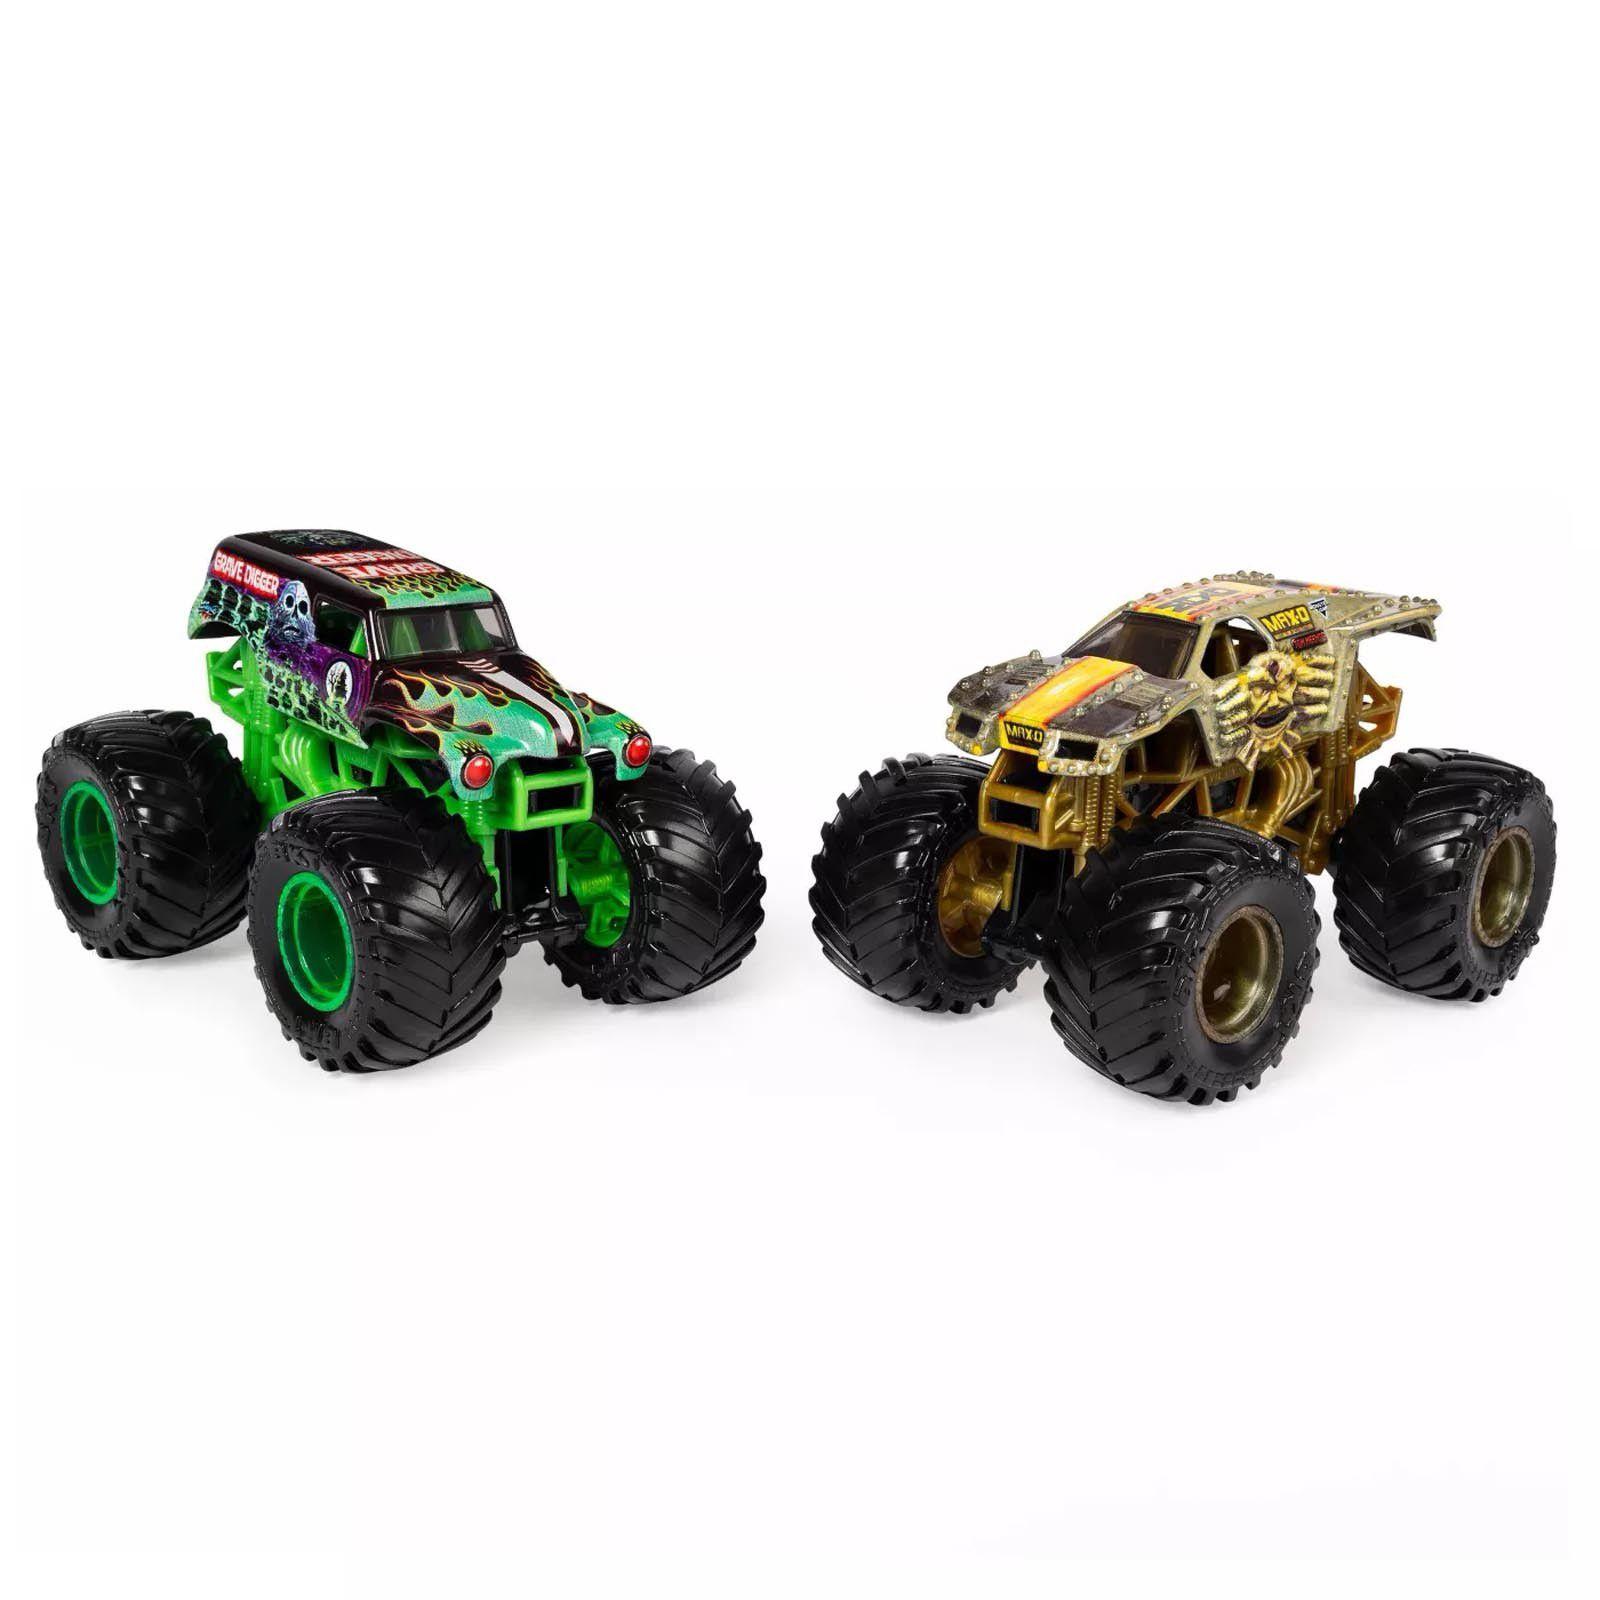 Monster Jam Truck  2 Carros - Grave Digger Vs Max-D 1:64